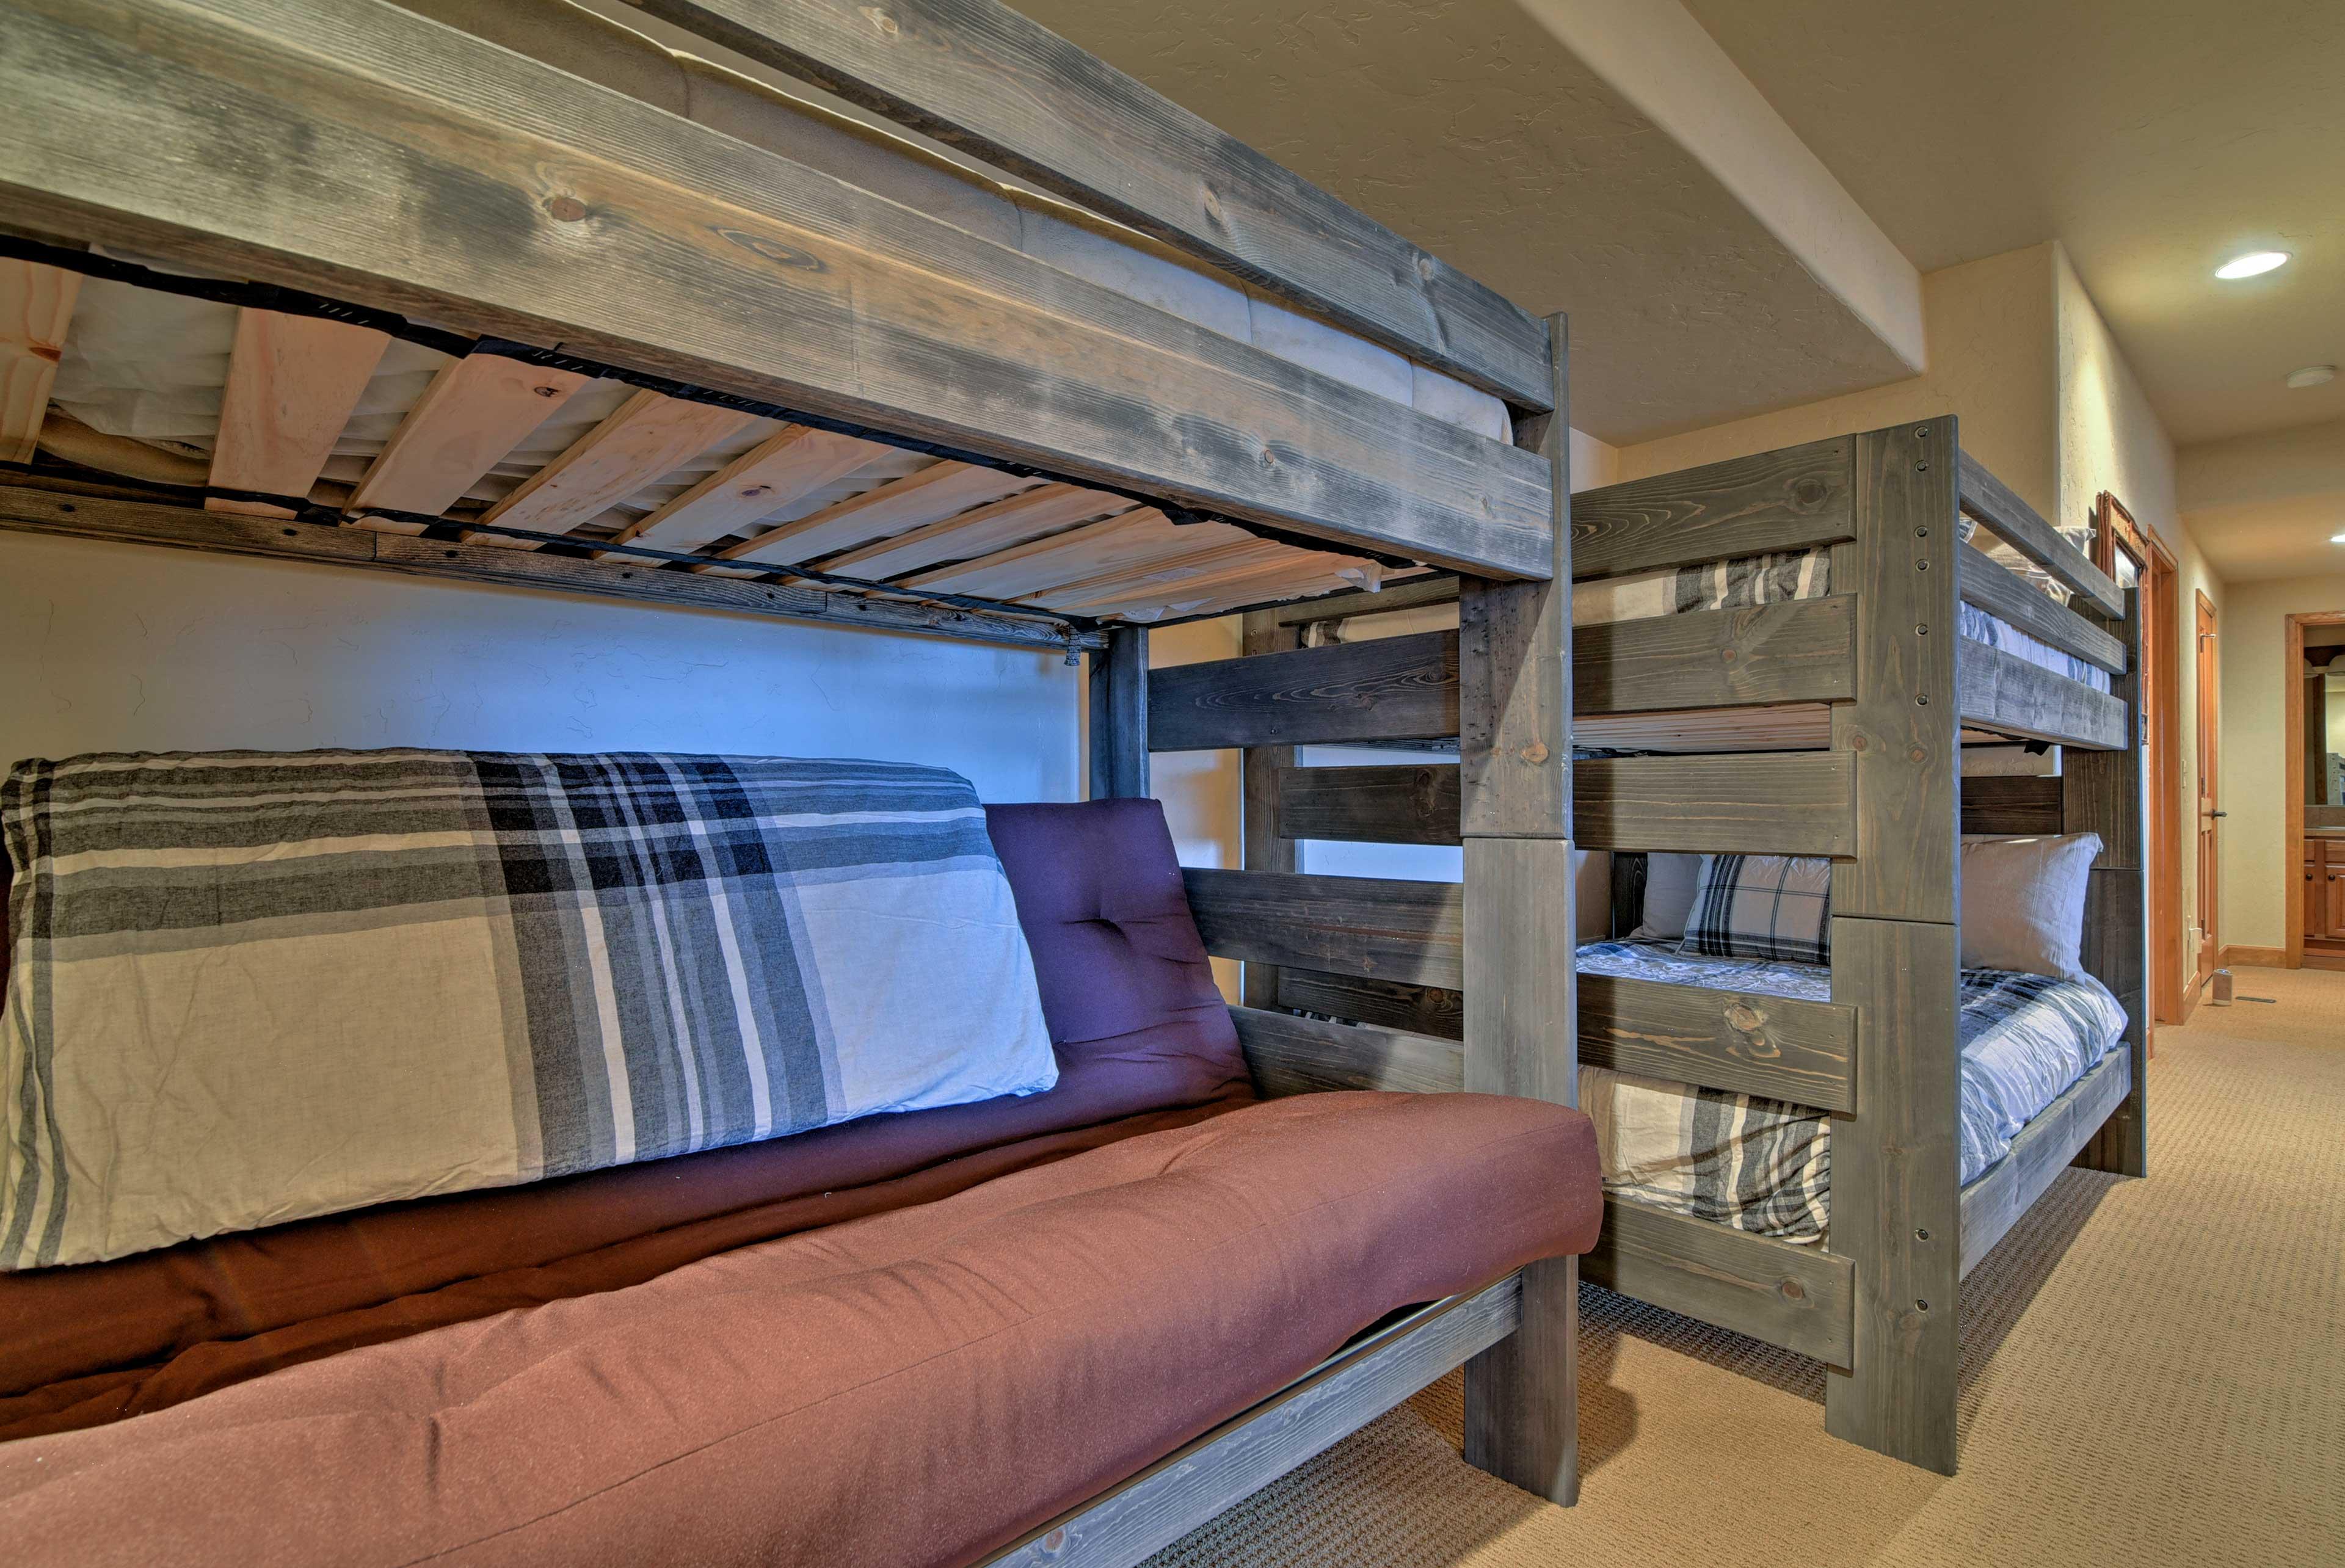 Basement   Full Bunk Bed   Lofted Twin Bed   Full Futon